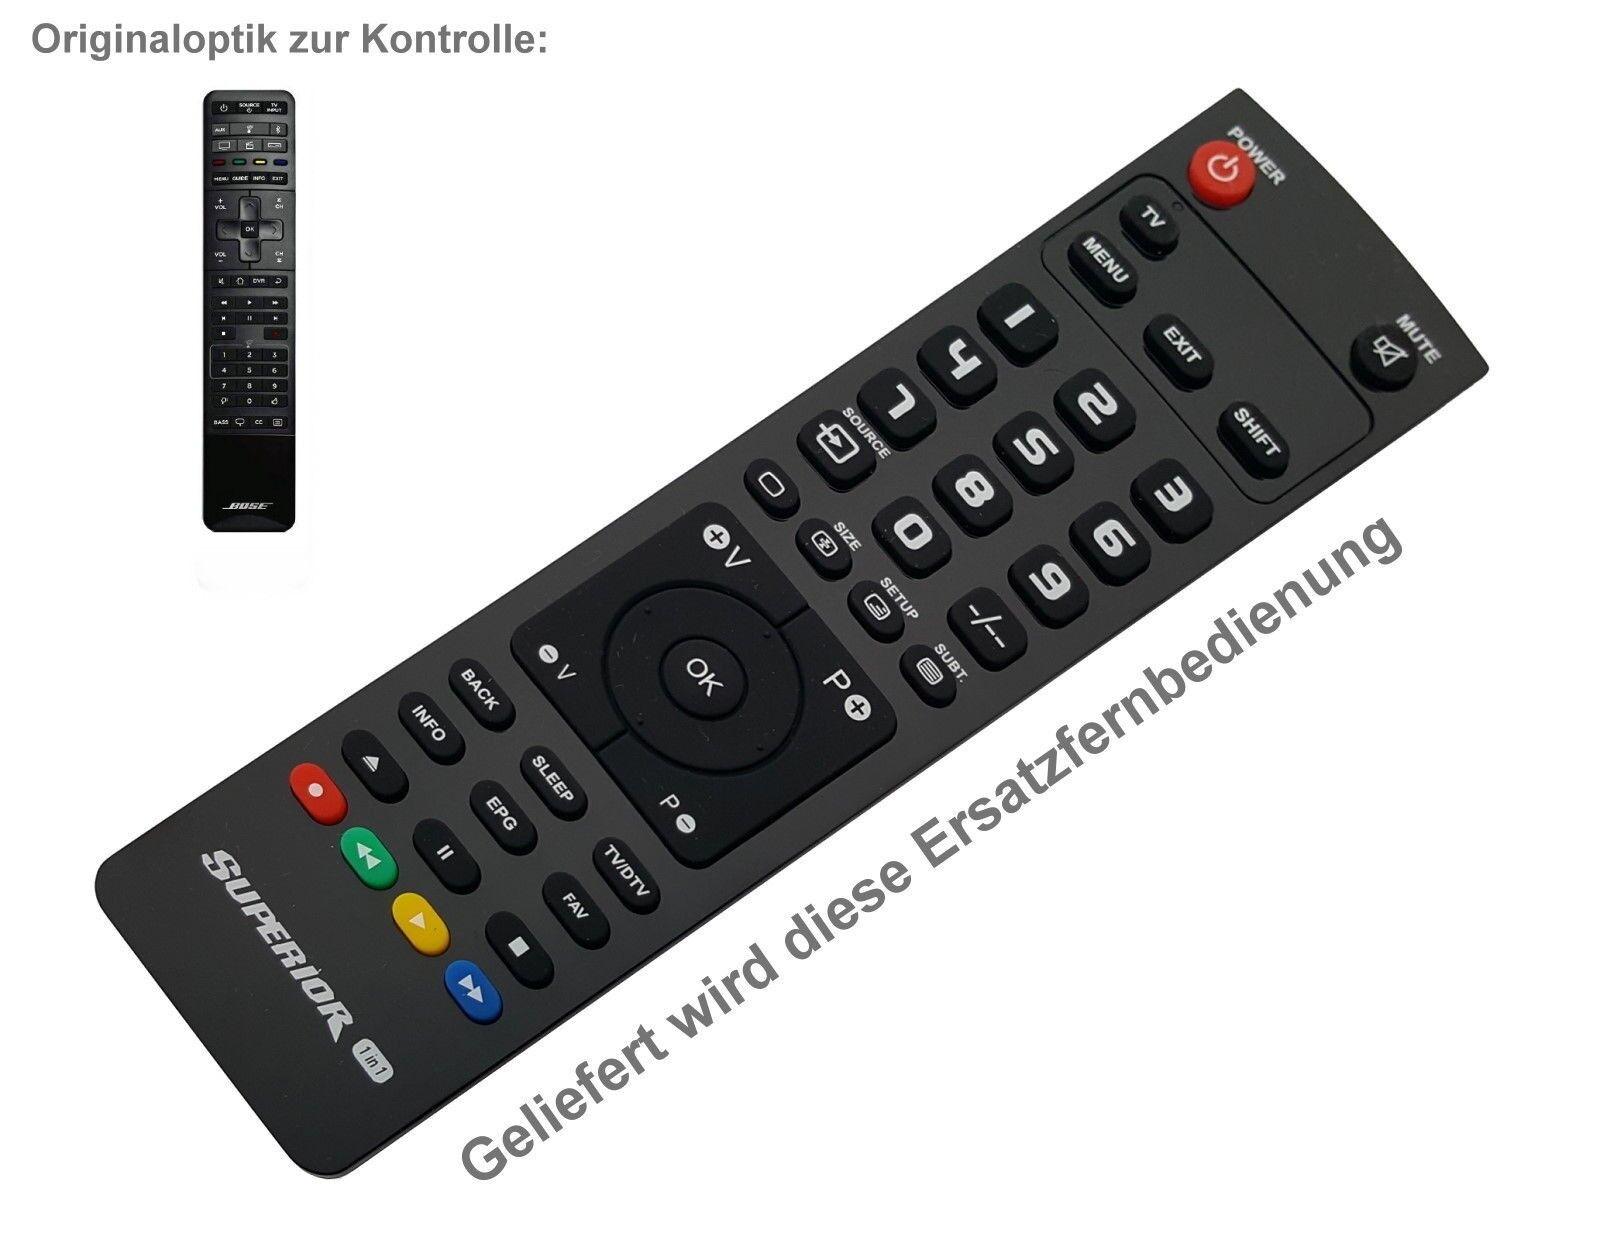 NEUWARE Ersatz Fernbedienung für BOSE HI-FI Soundtouch 300 Soundbar